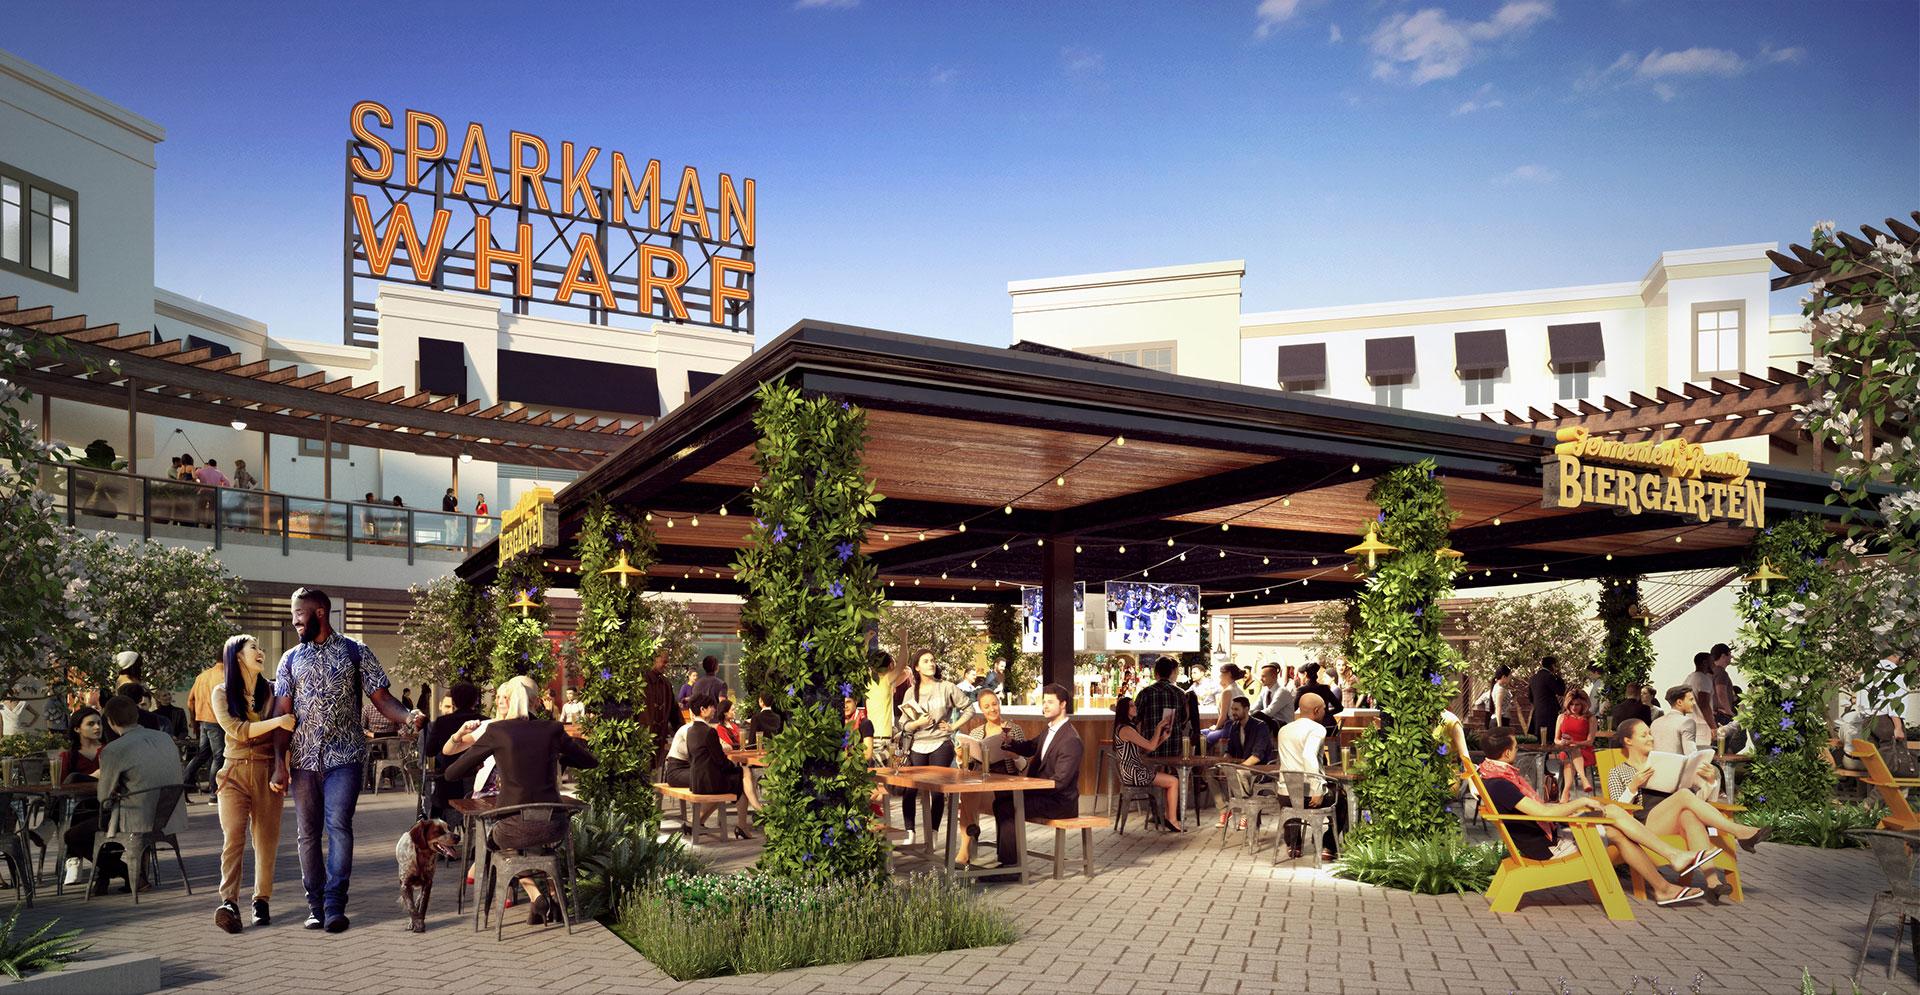 Sparkman Wharf Beer Garden